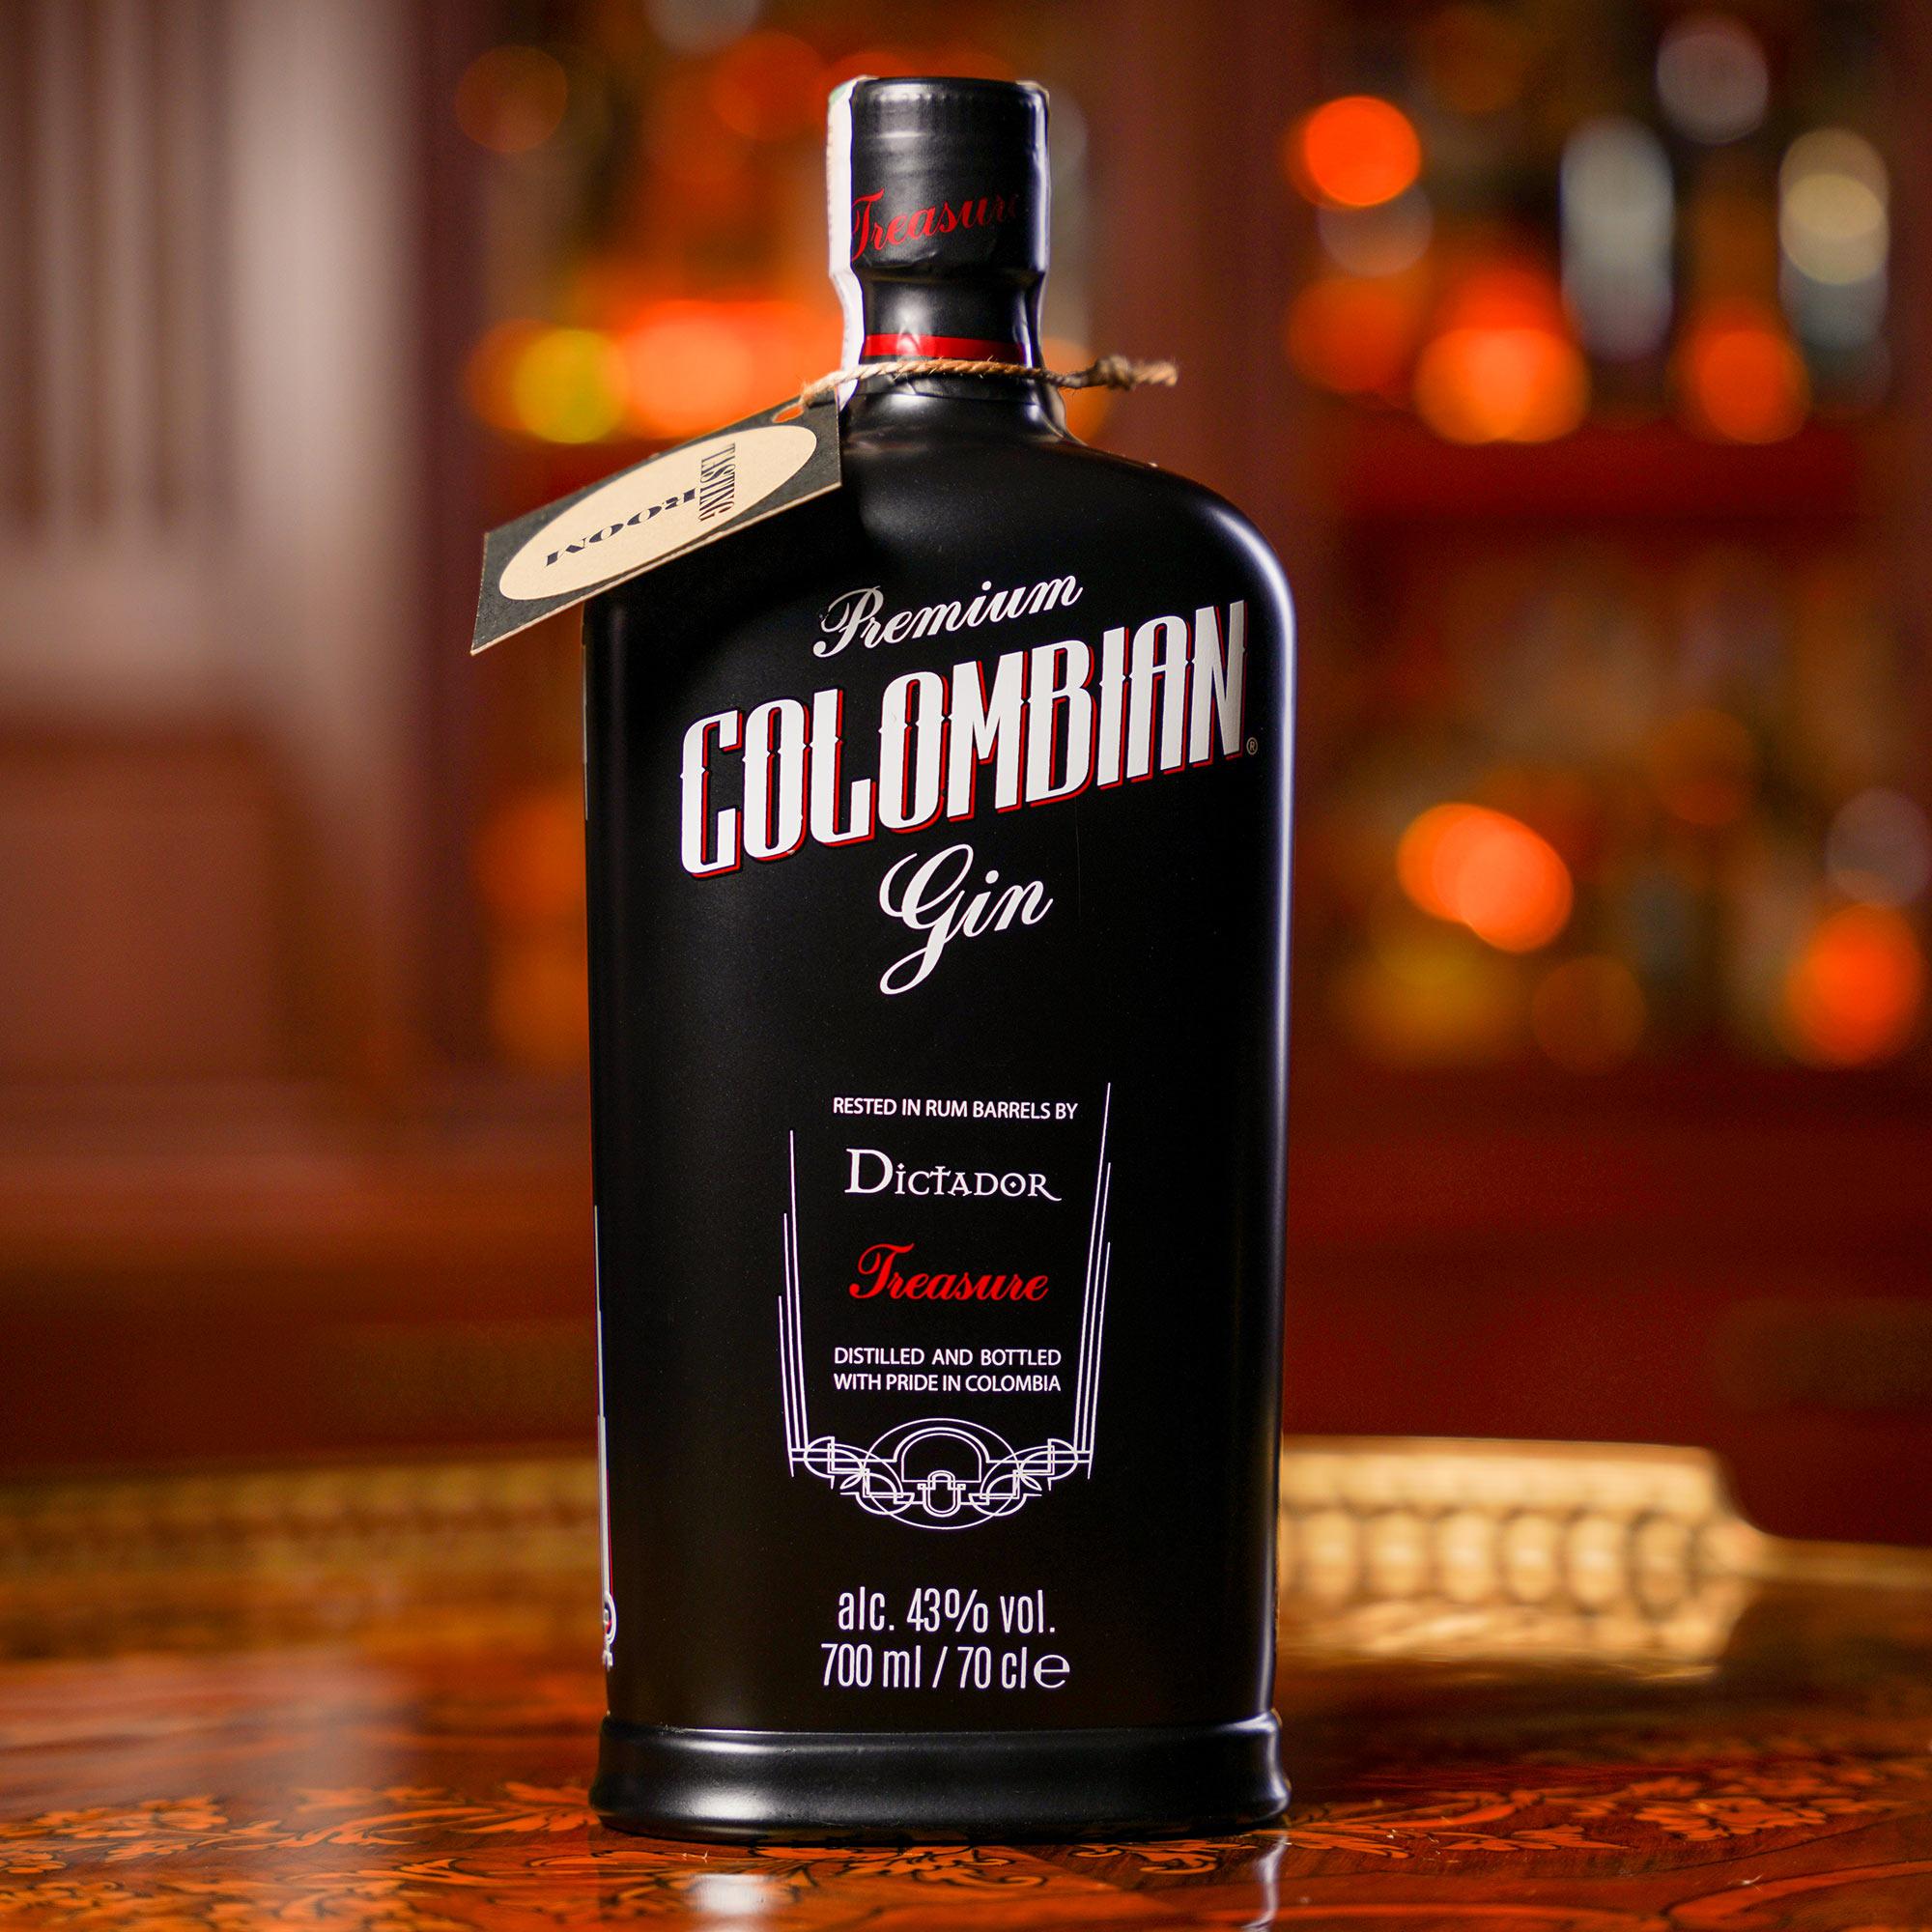 Dictador Premium Colombian Gin Treasure /Диктадор Премиум Колумбия Джин Трежър